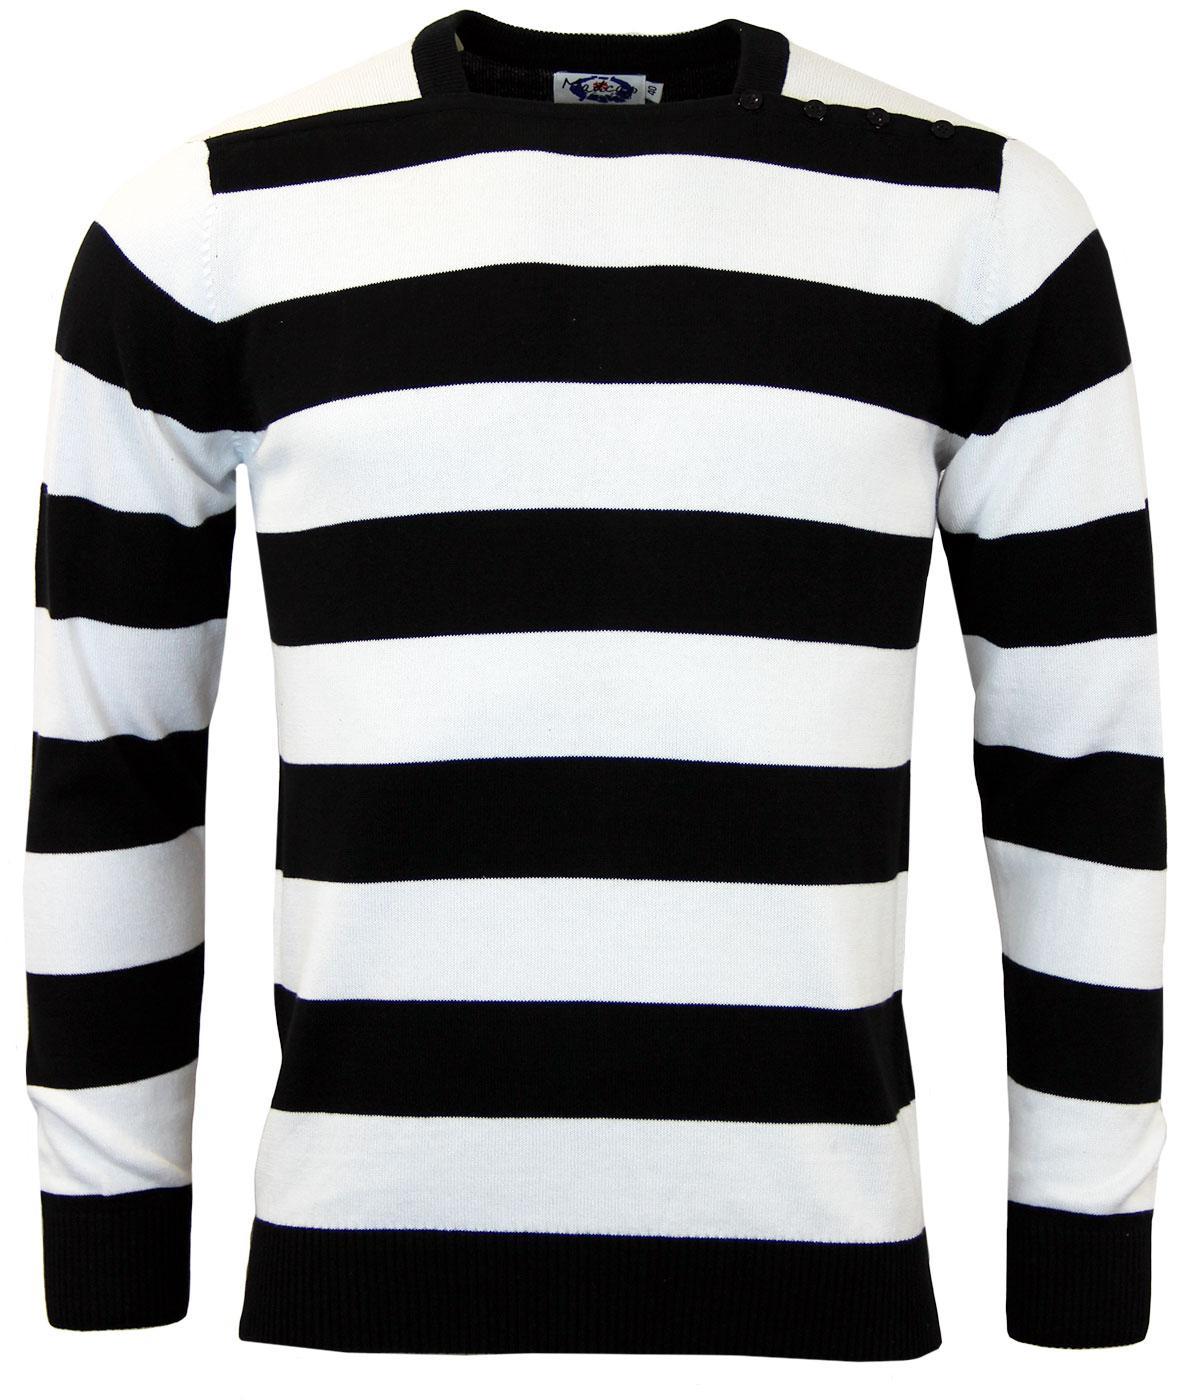 online store 8d614 9fe53 Retro Chelsea Shirts Ebay | Toffee Art